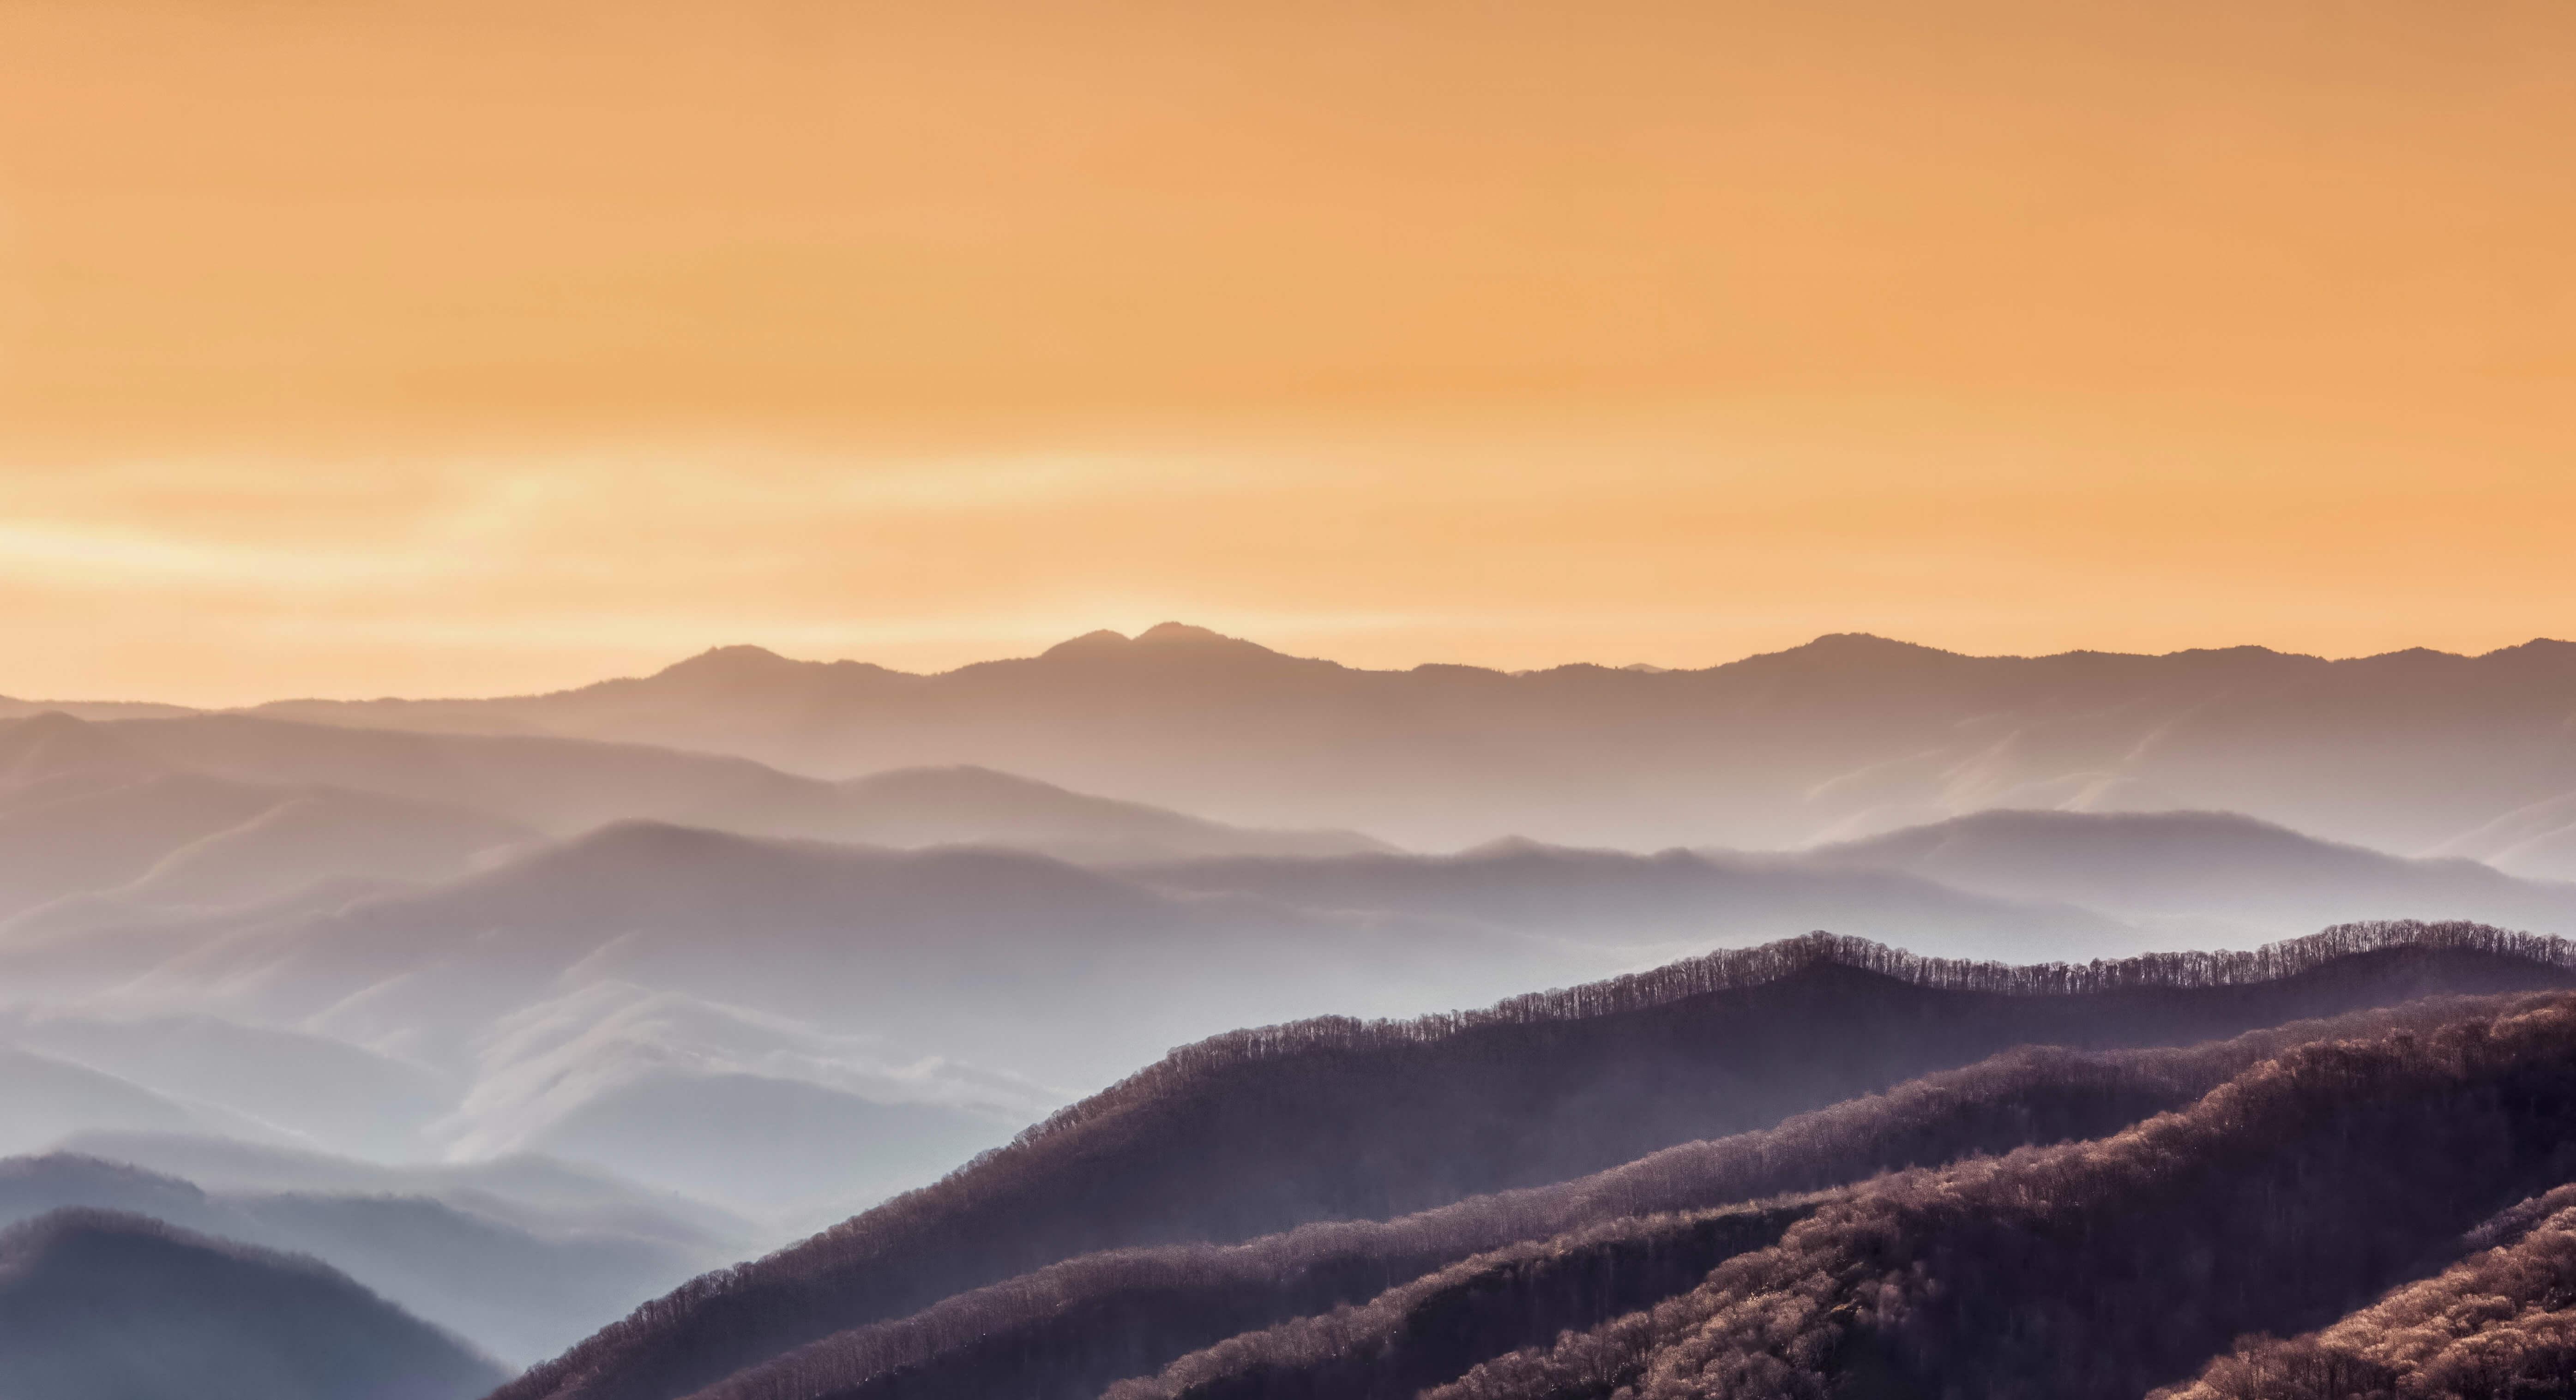 A landscape shot of a mountain range